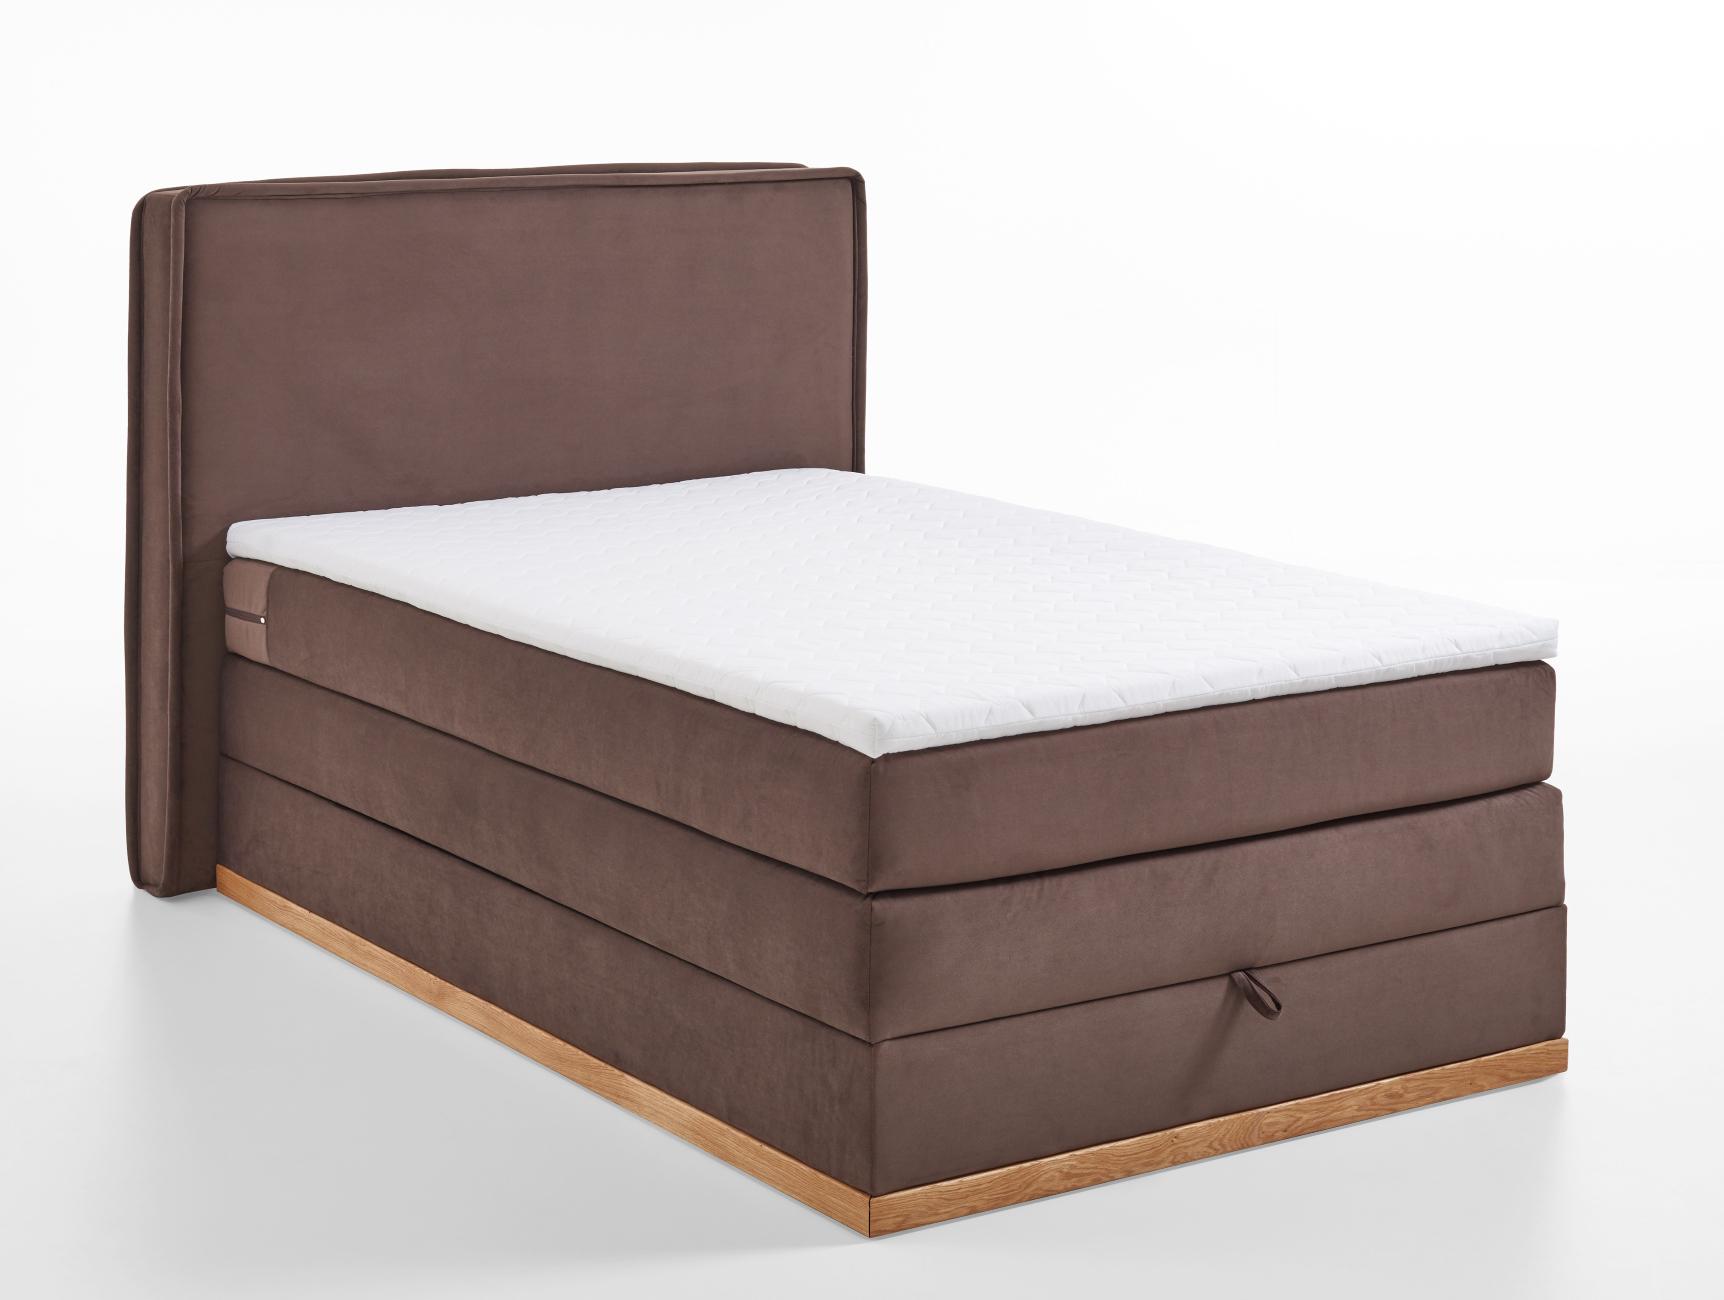 Boxspringbett Nr.1901 120x200 mit Bettkasten